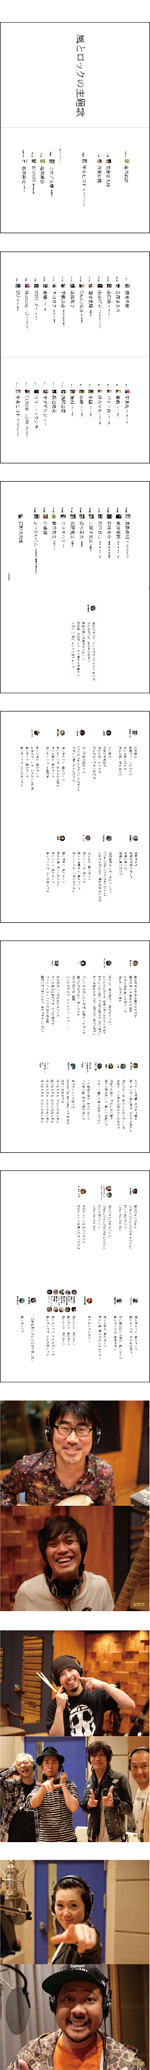 20140505_tokubetsu6s.jpg